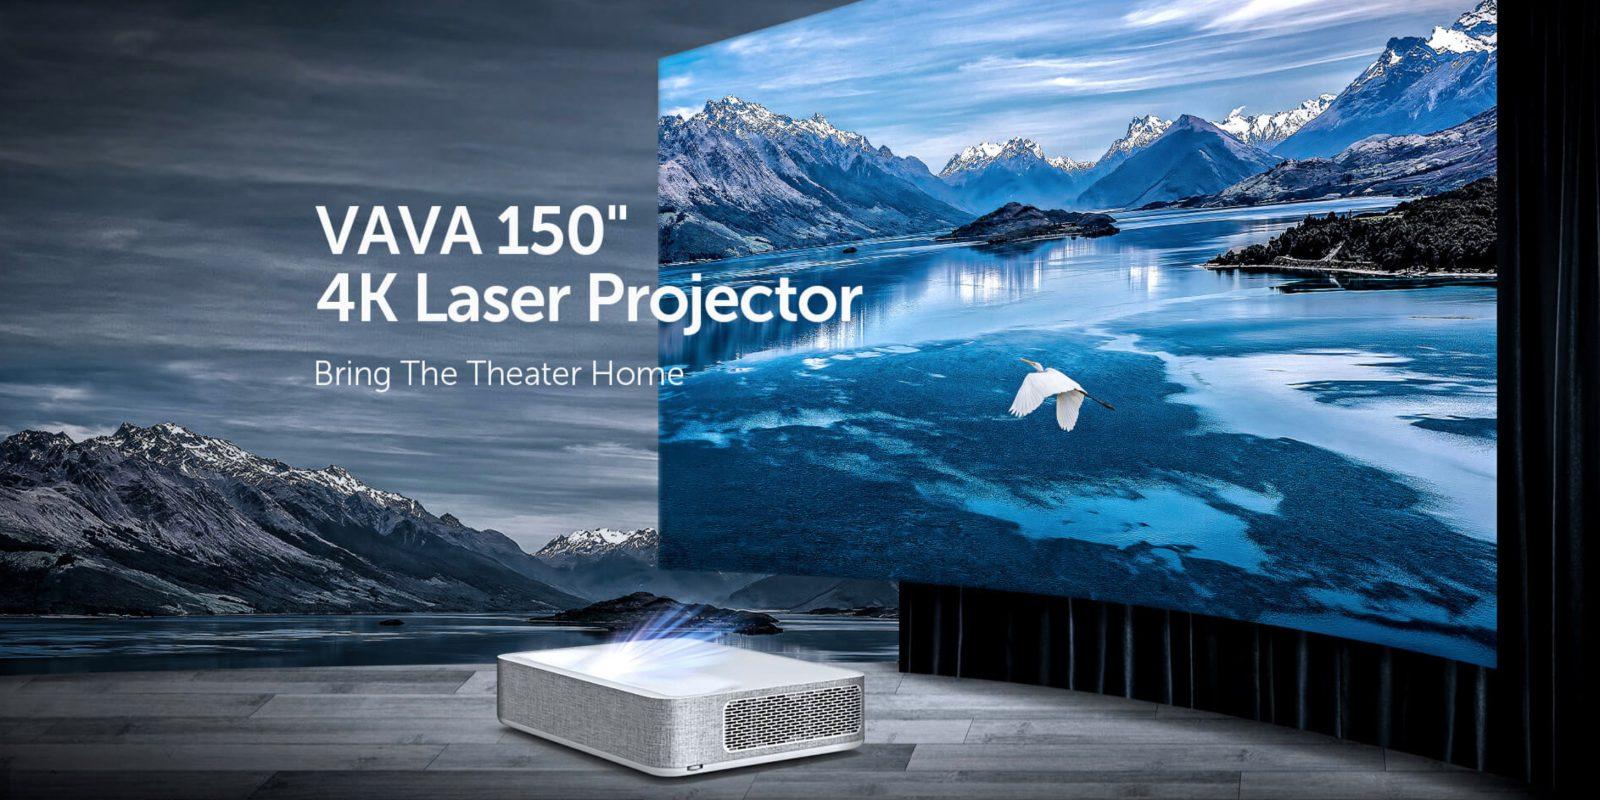 VAVA 4K Laser Projector example 3